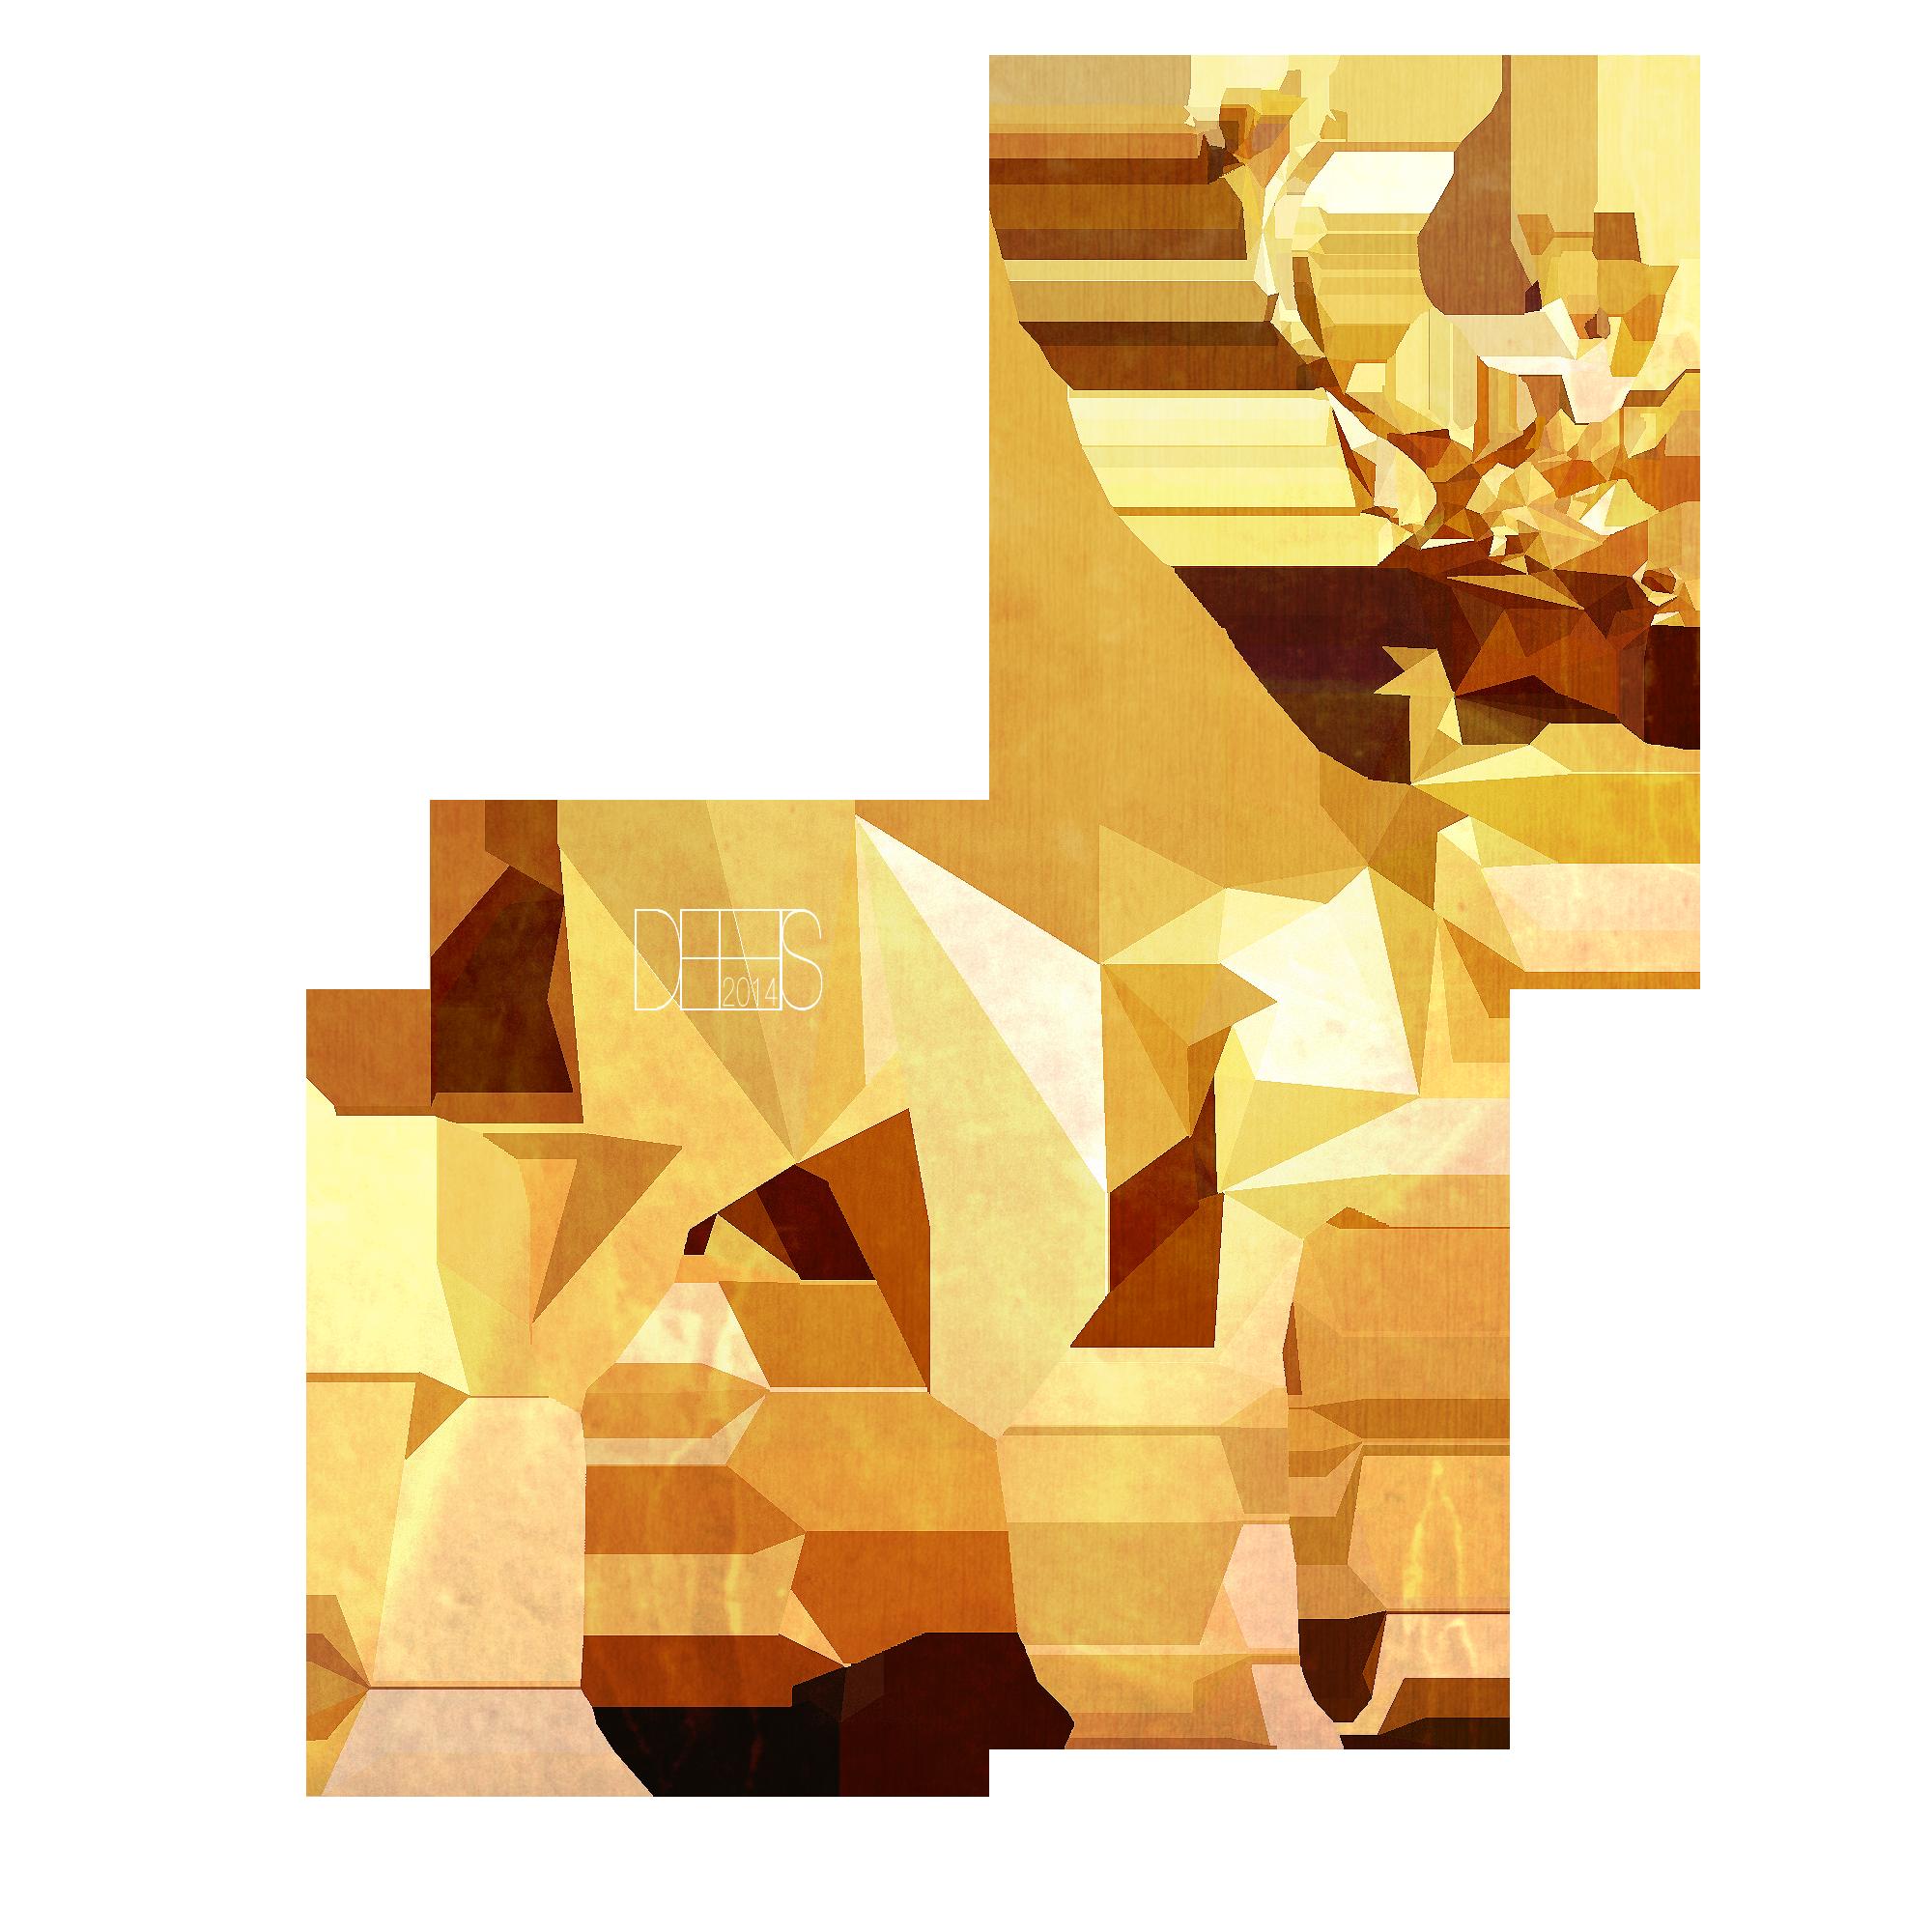 deer gray low poly - photo #24